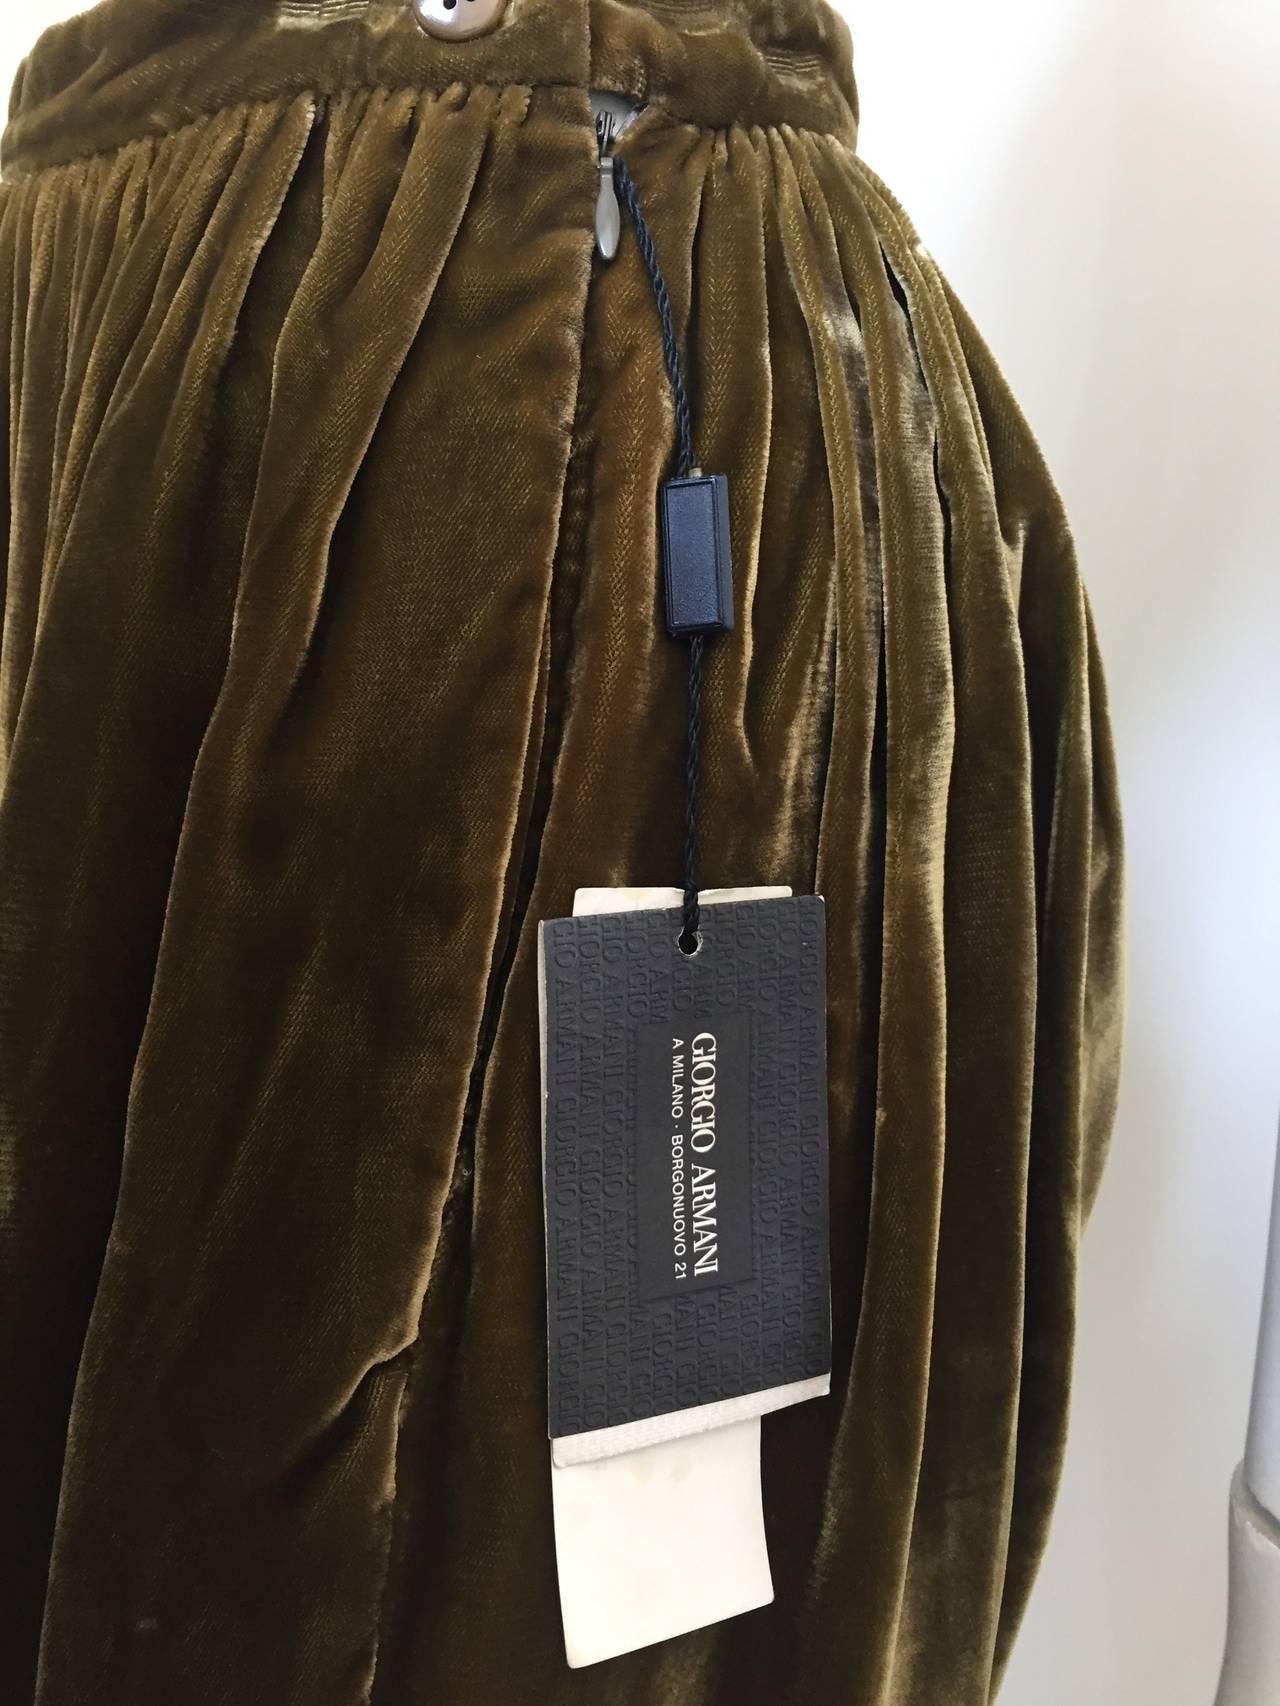 Giorgio Armani Velvet Bloomers Size 4. 8